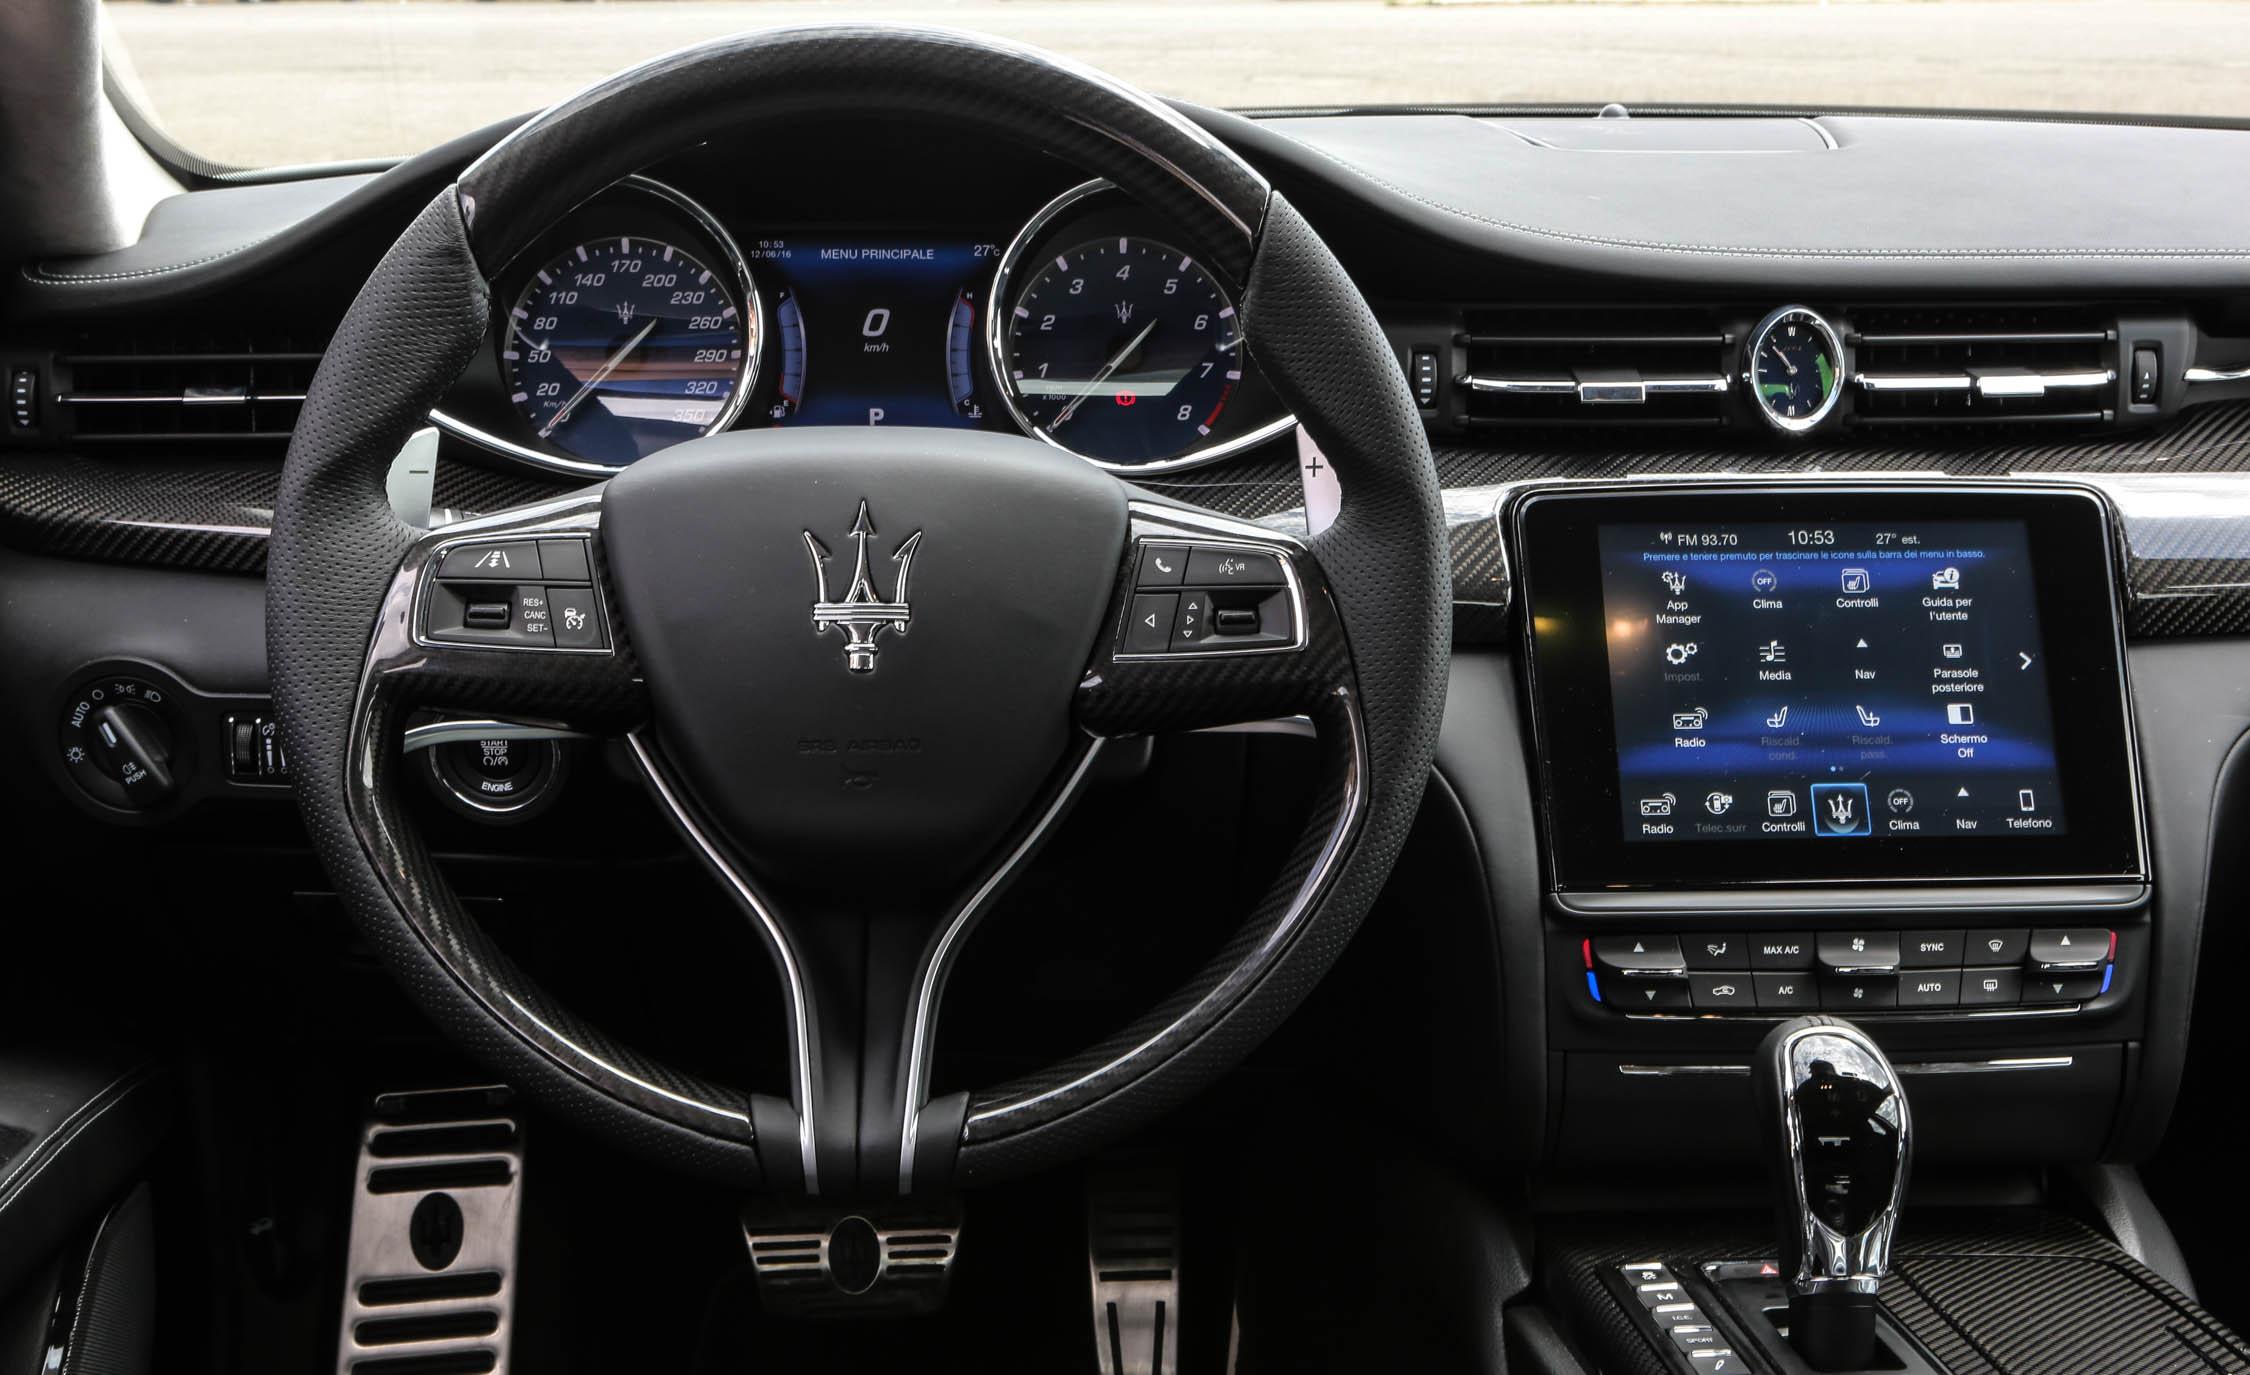 2017 Maserati Quattroporte GTS GranSport (Photo 31 of 55)